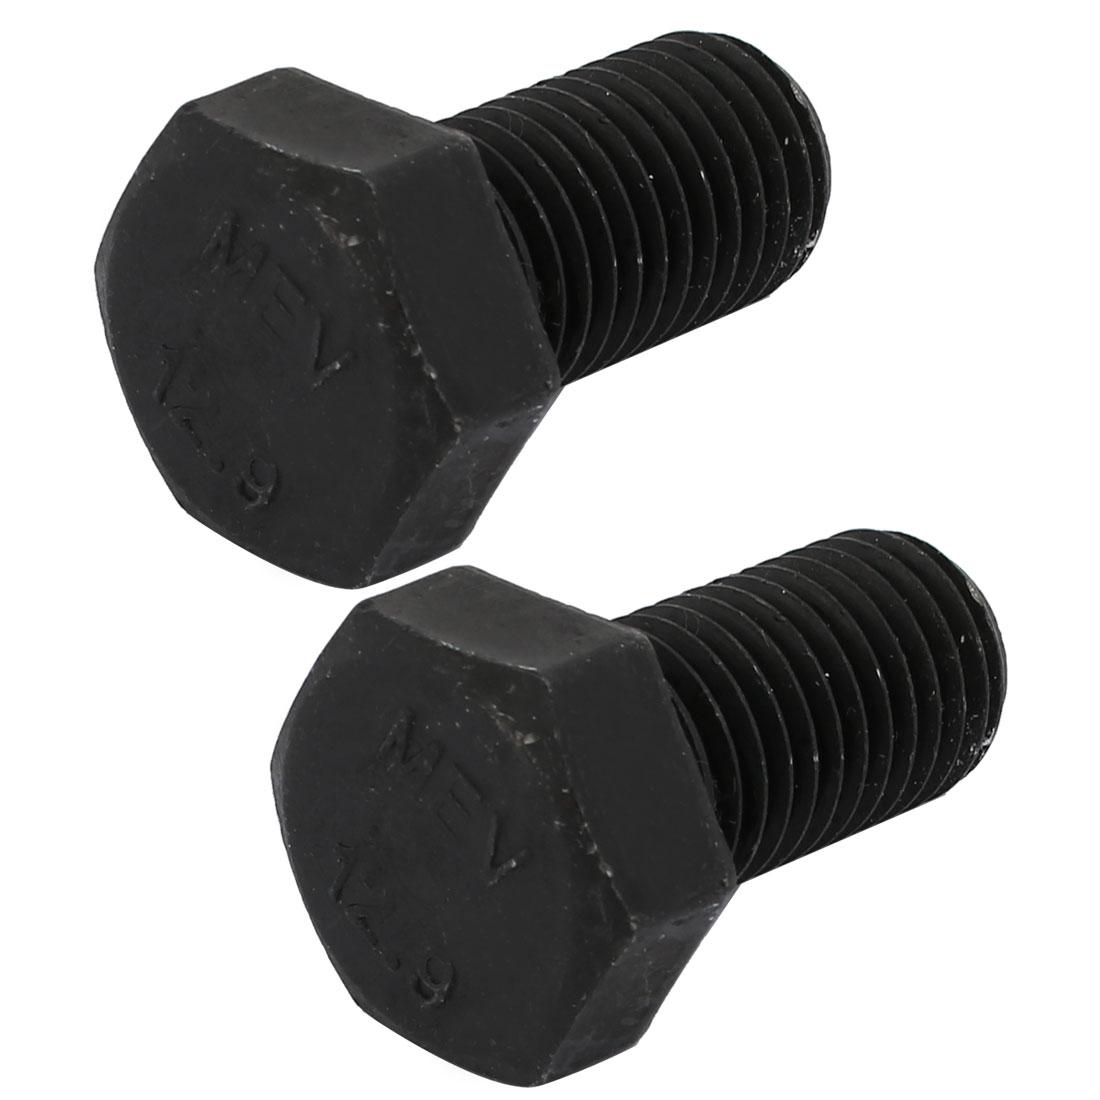 2pcs M16x30mm Thread 12.9 Grade External Hex Head Left Hand Screw Bolt Black